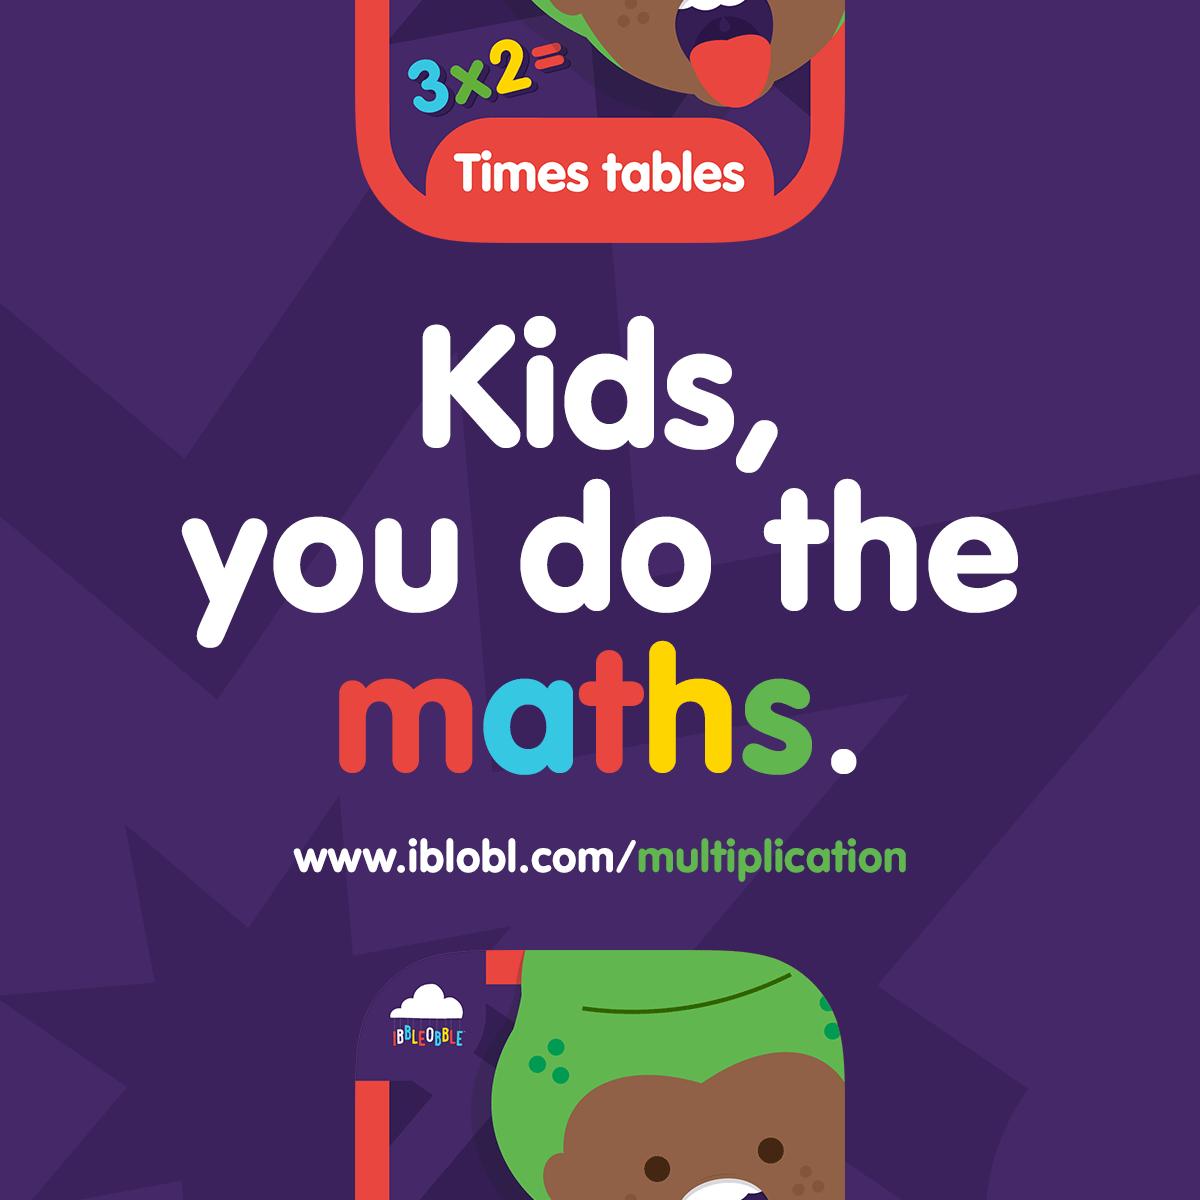 🐸 #Practice #multiplication the boring way or the FUN way... #kids, you do the #maths!     #TimesTables #Math #Mathematics #primary #primarySchool #school #WednesdayMotivation #WednesdayWisdom #WednesdayThoughts